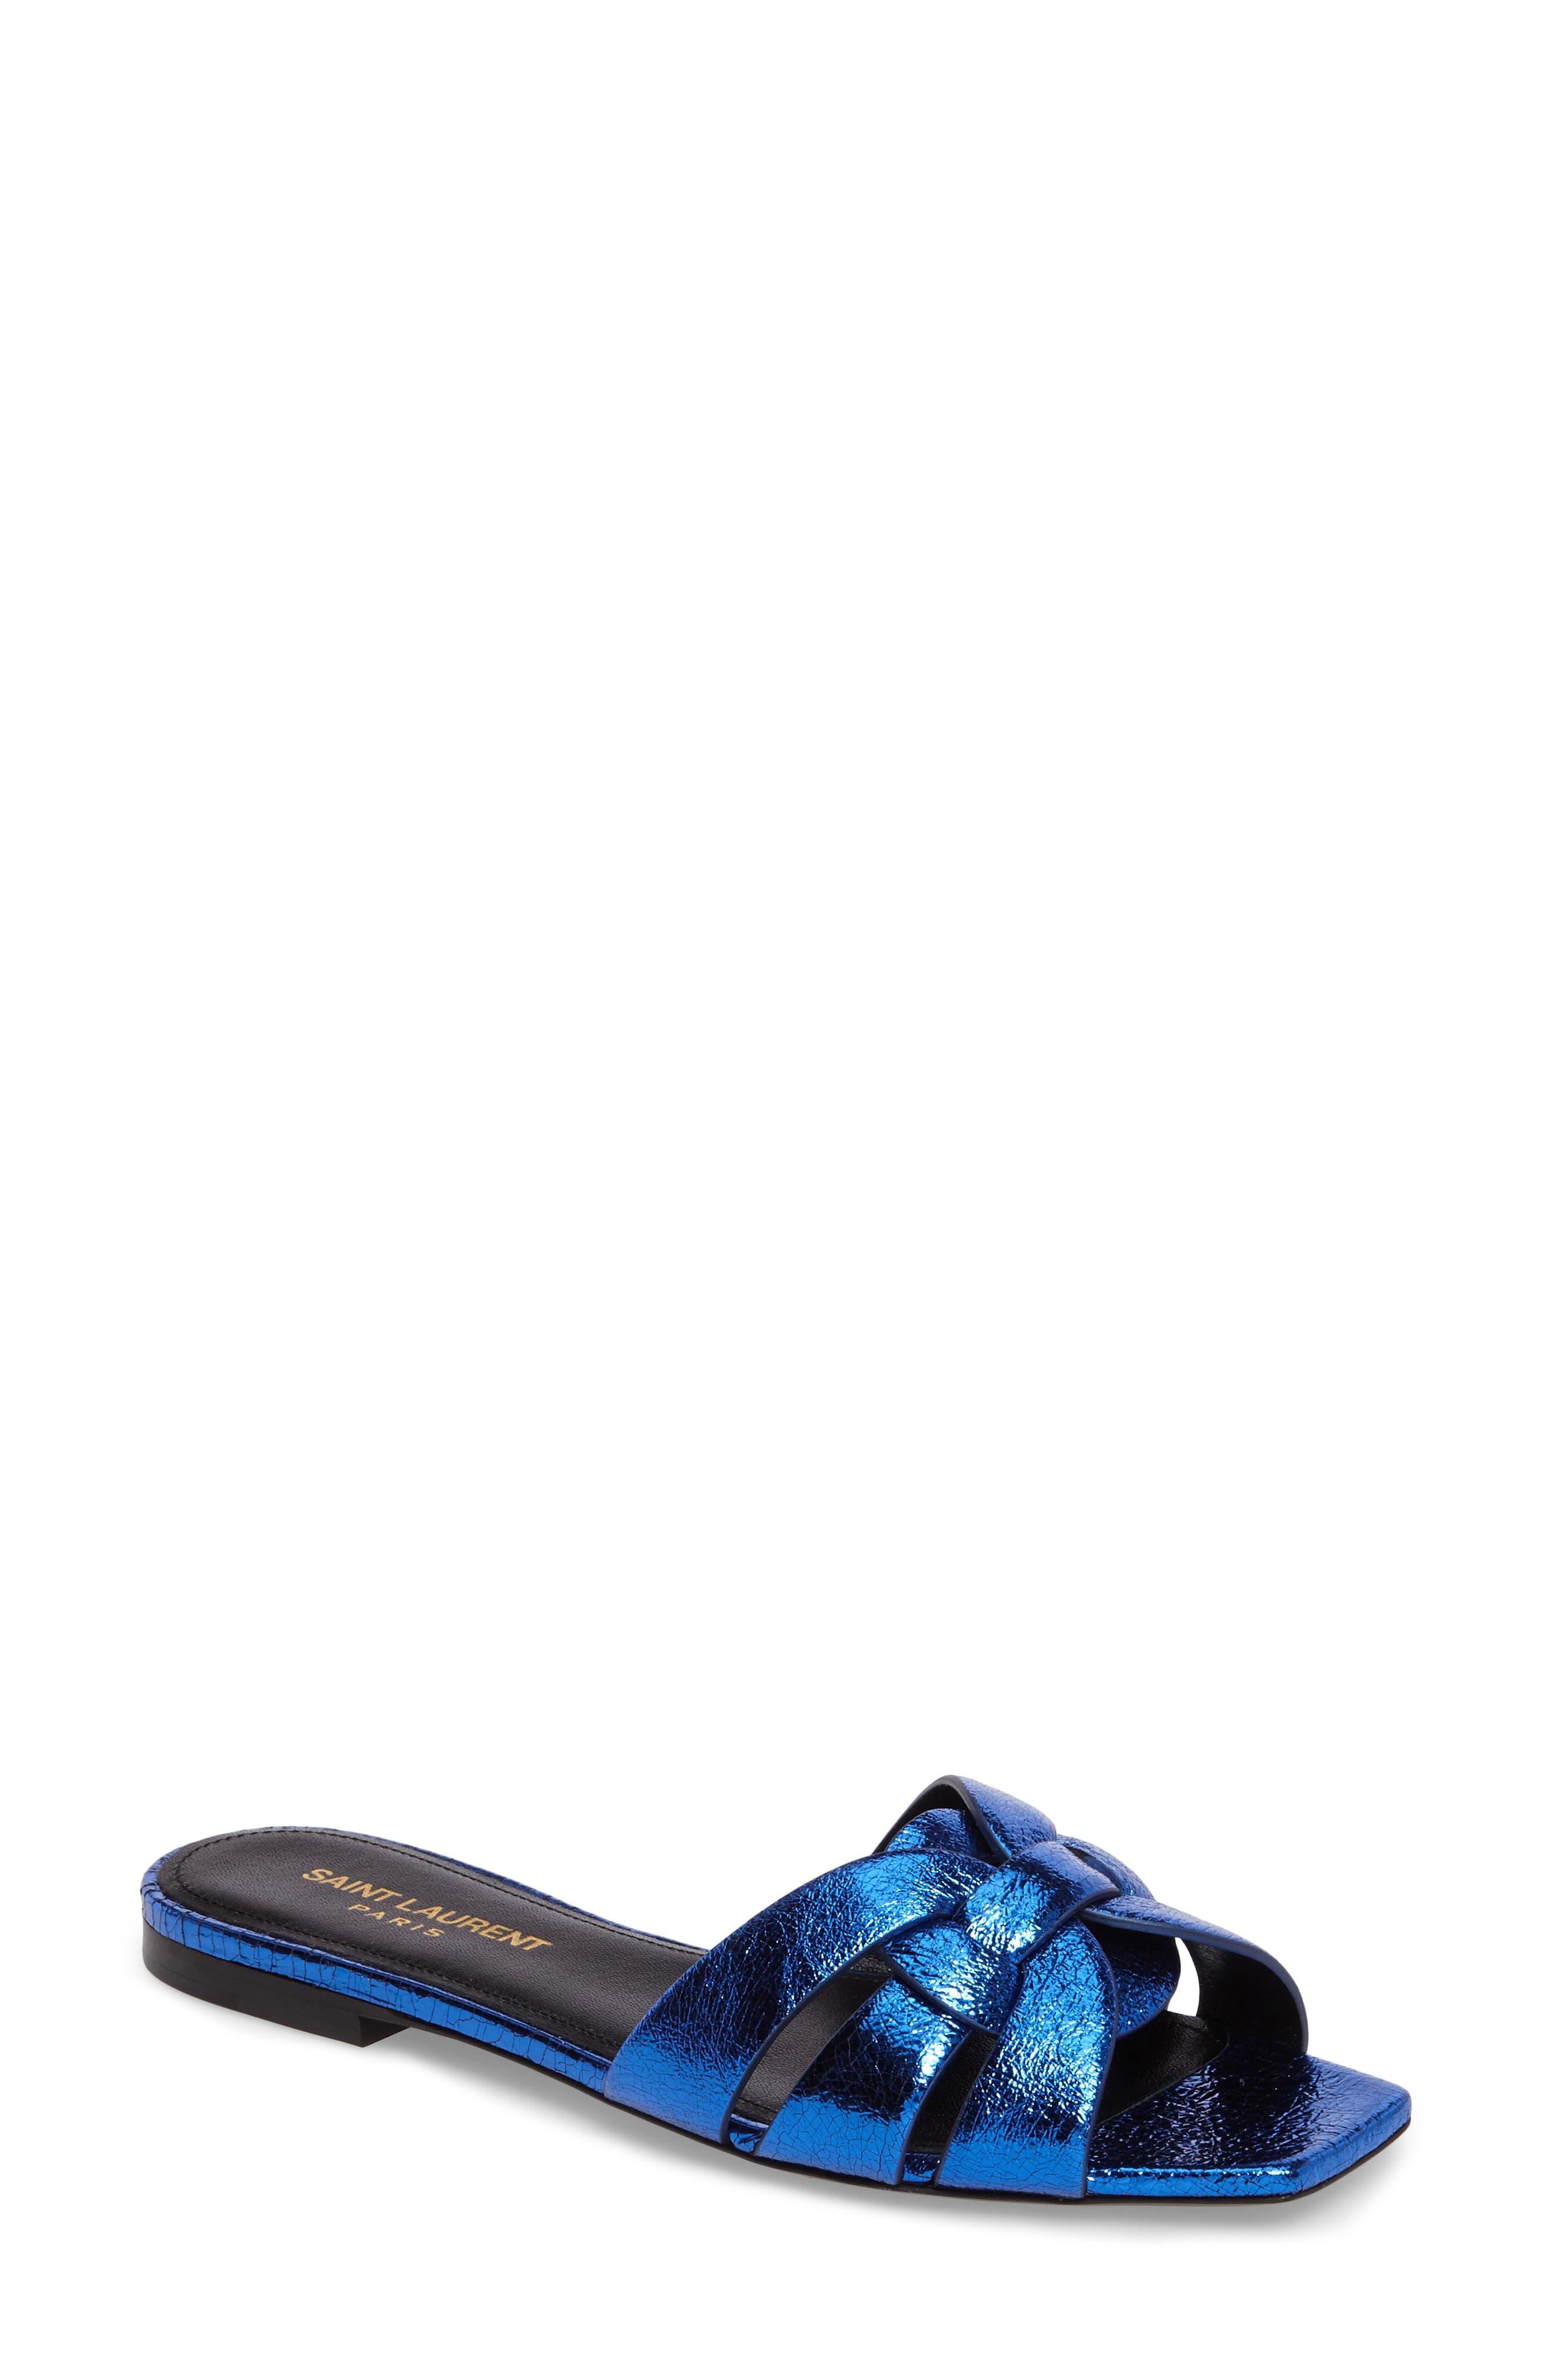 Pieds Metallic Slide Sandal,                             Main thumbnail 1, color,                             Blue Metal